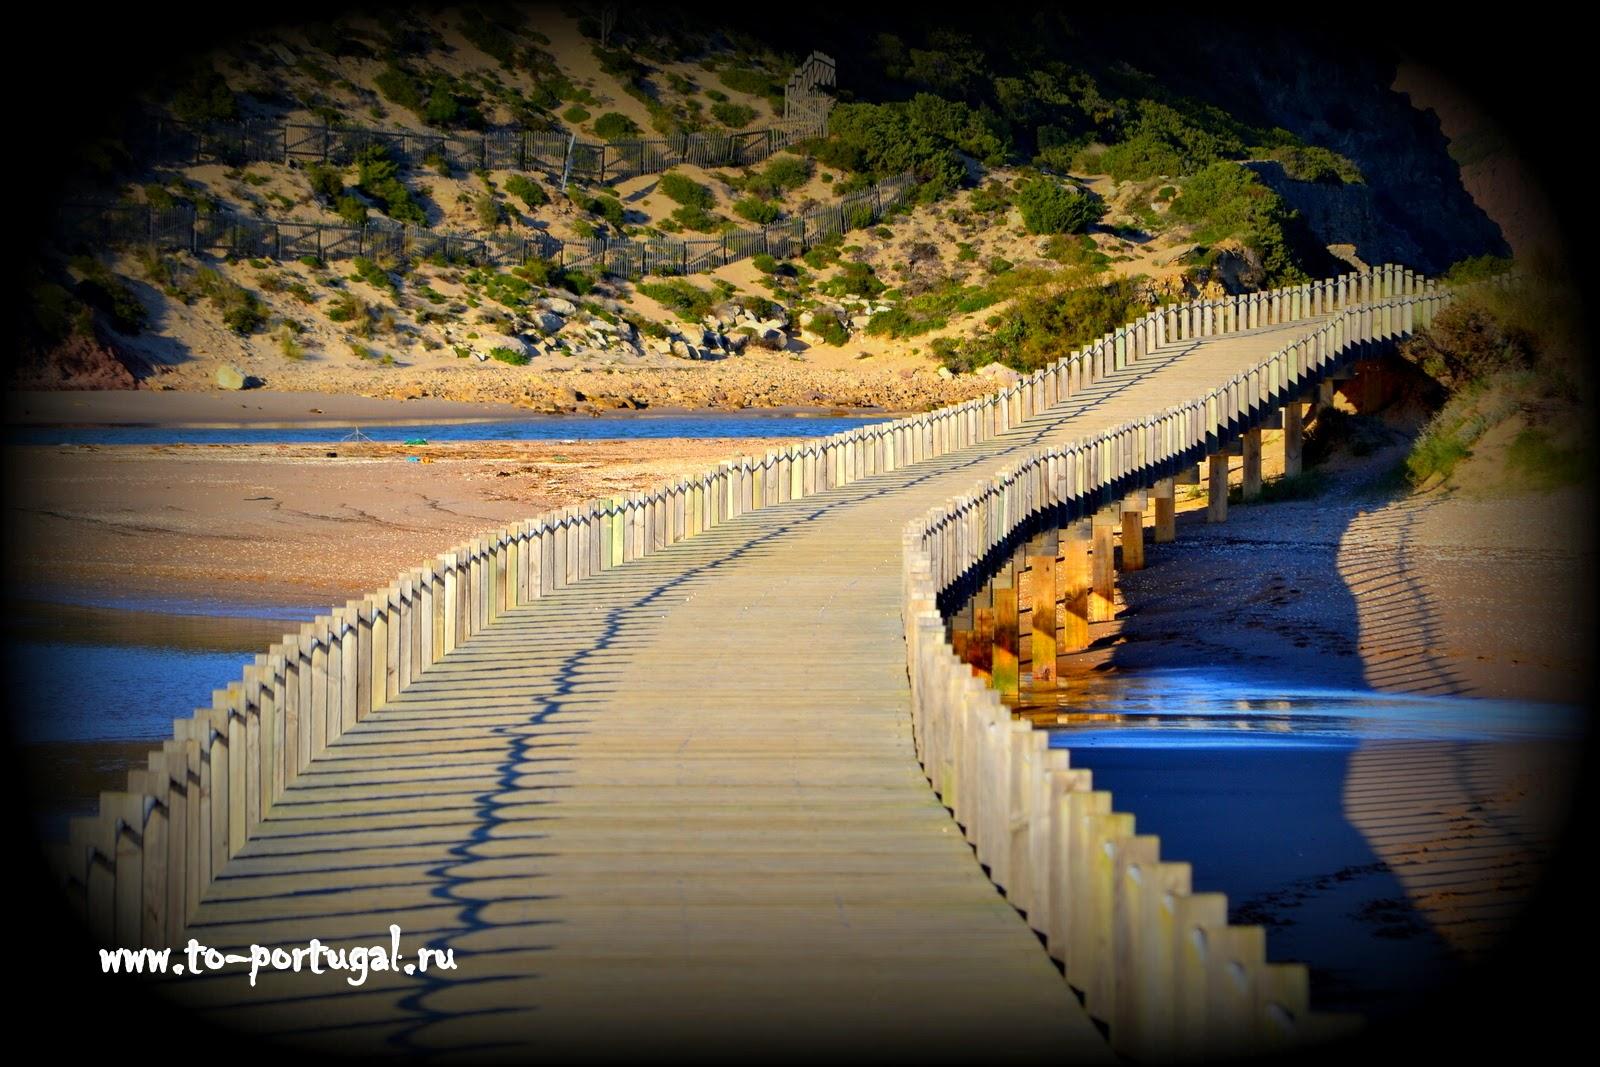 фотографии Португалии